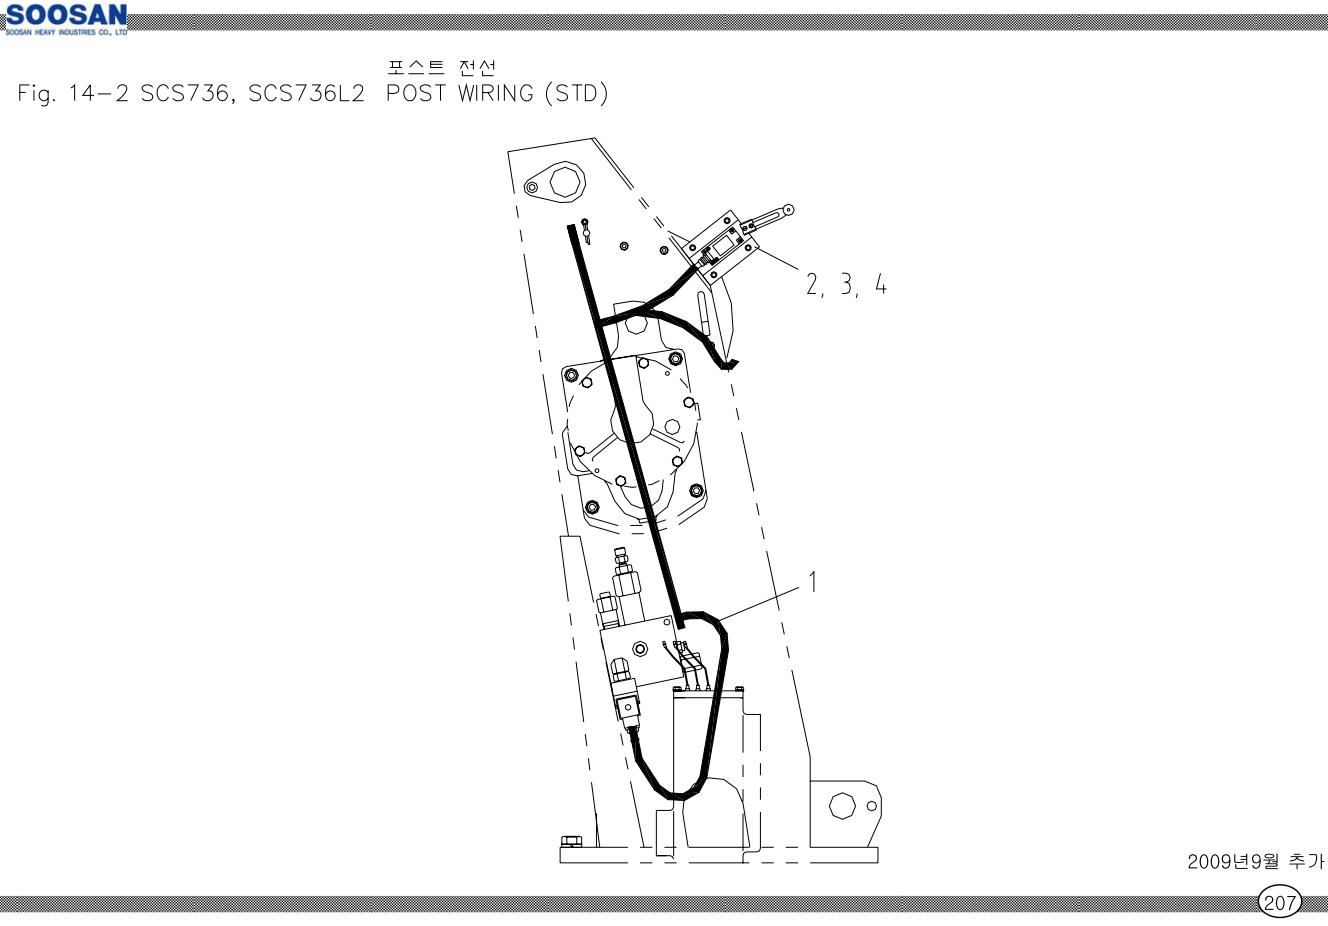 Электропроводка колонны(башни) Soosan SCS 736 STD